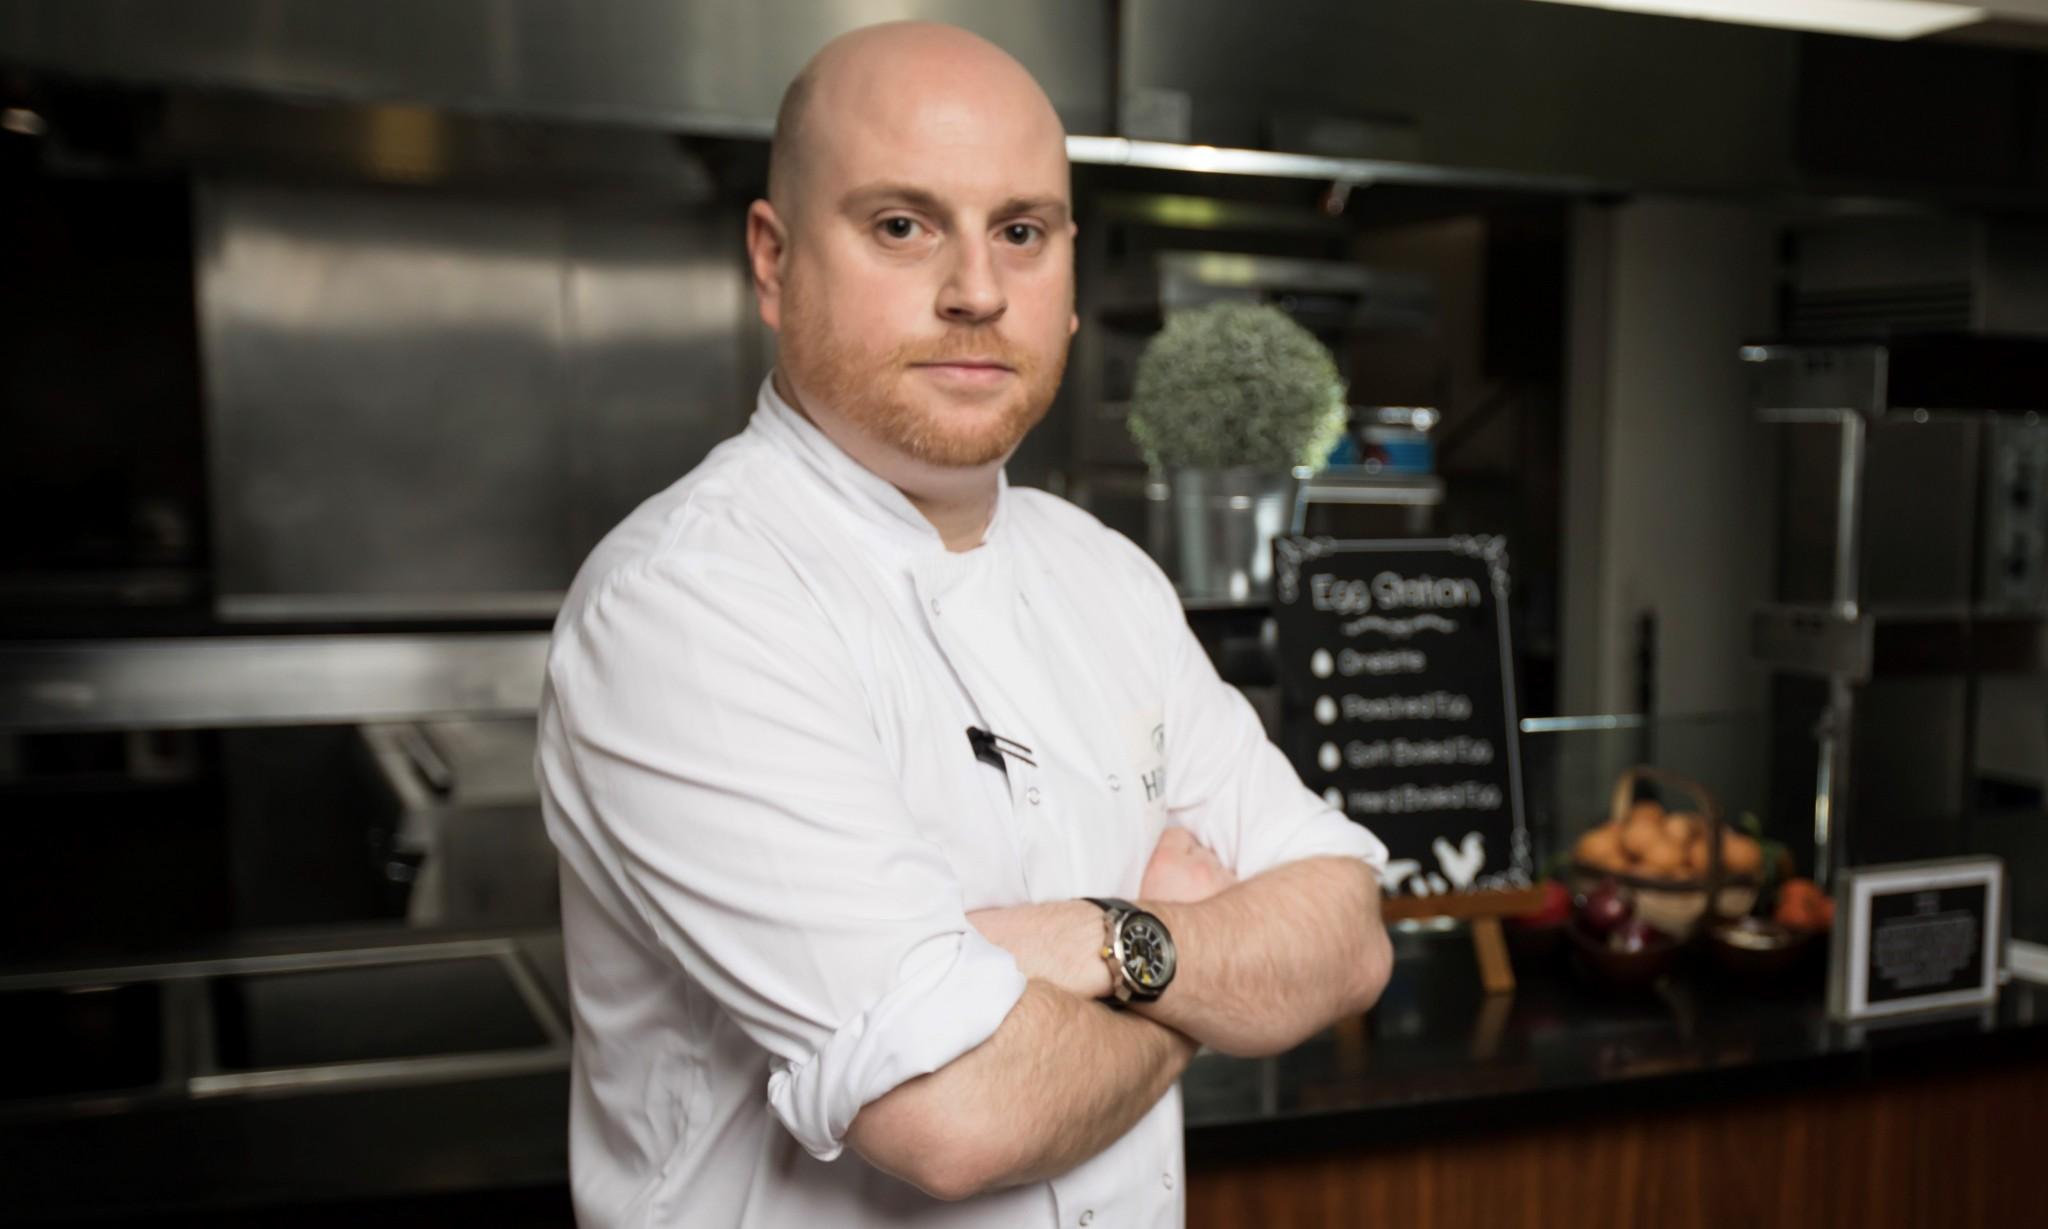 Hilton Glasgow Announce New Award Winning Executive Chef